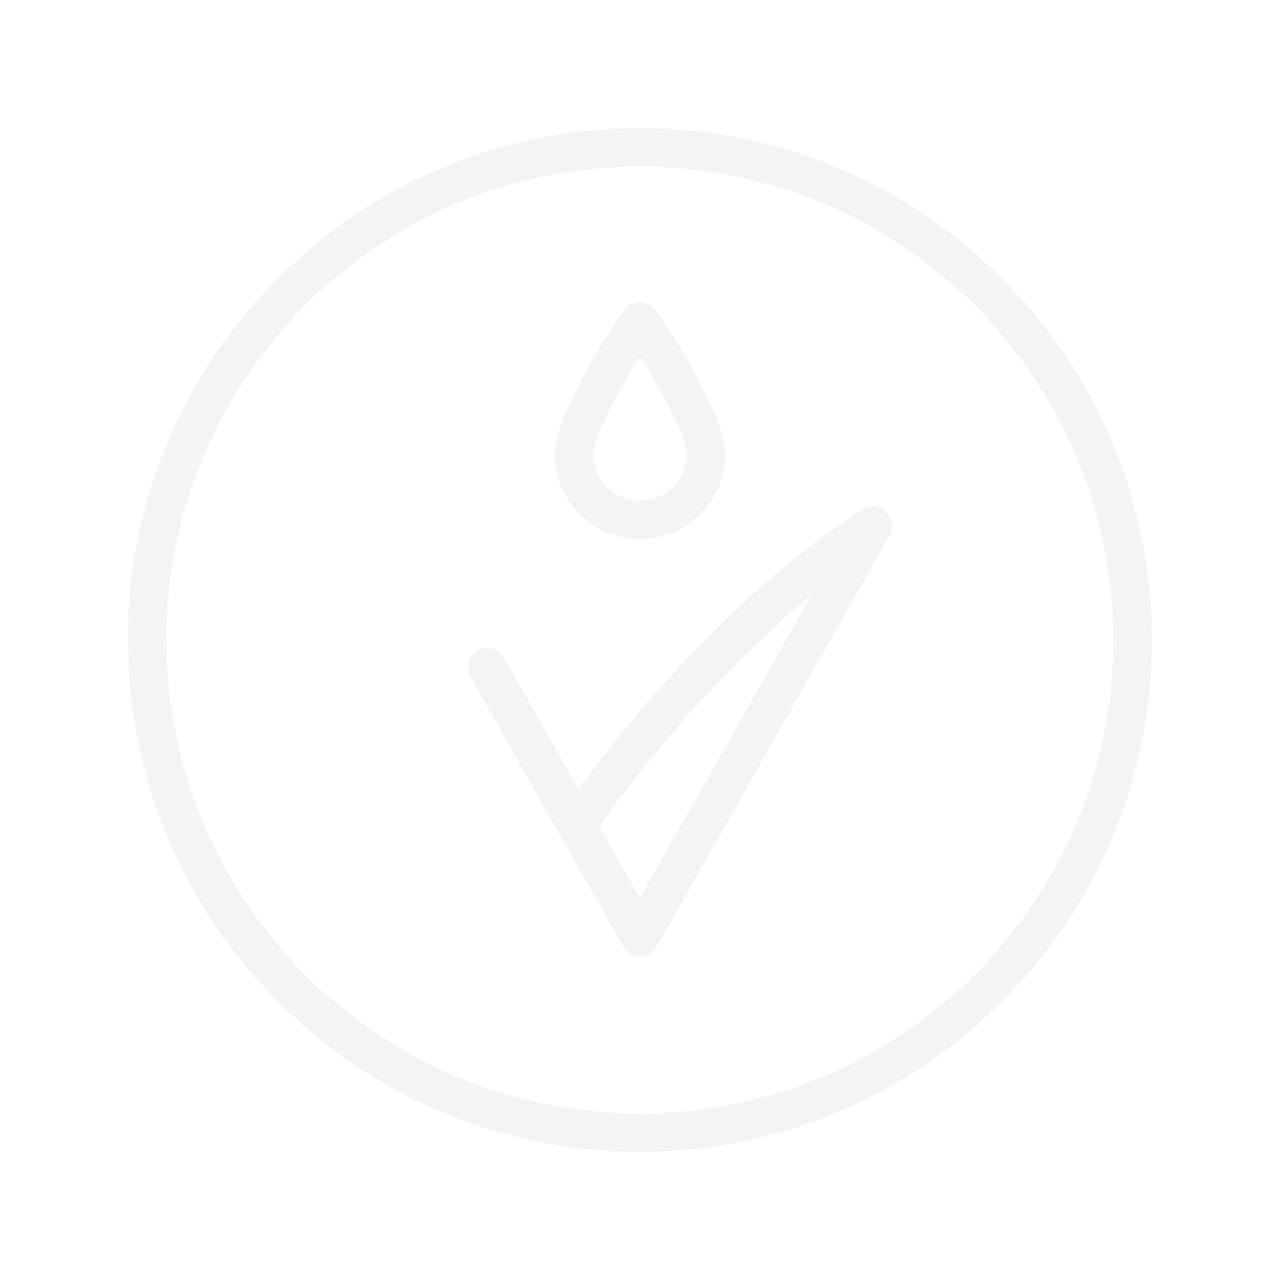 HOLIKA HOLIKA Golden Monkey Glamour Lip 3-Step средства для ухода за губами